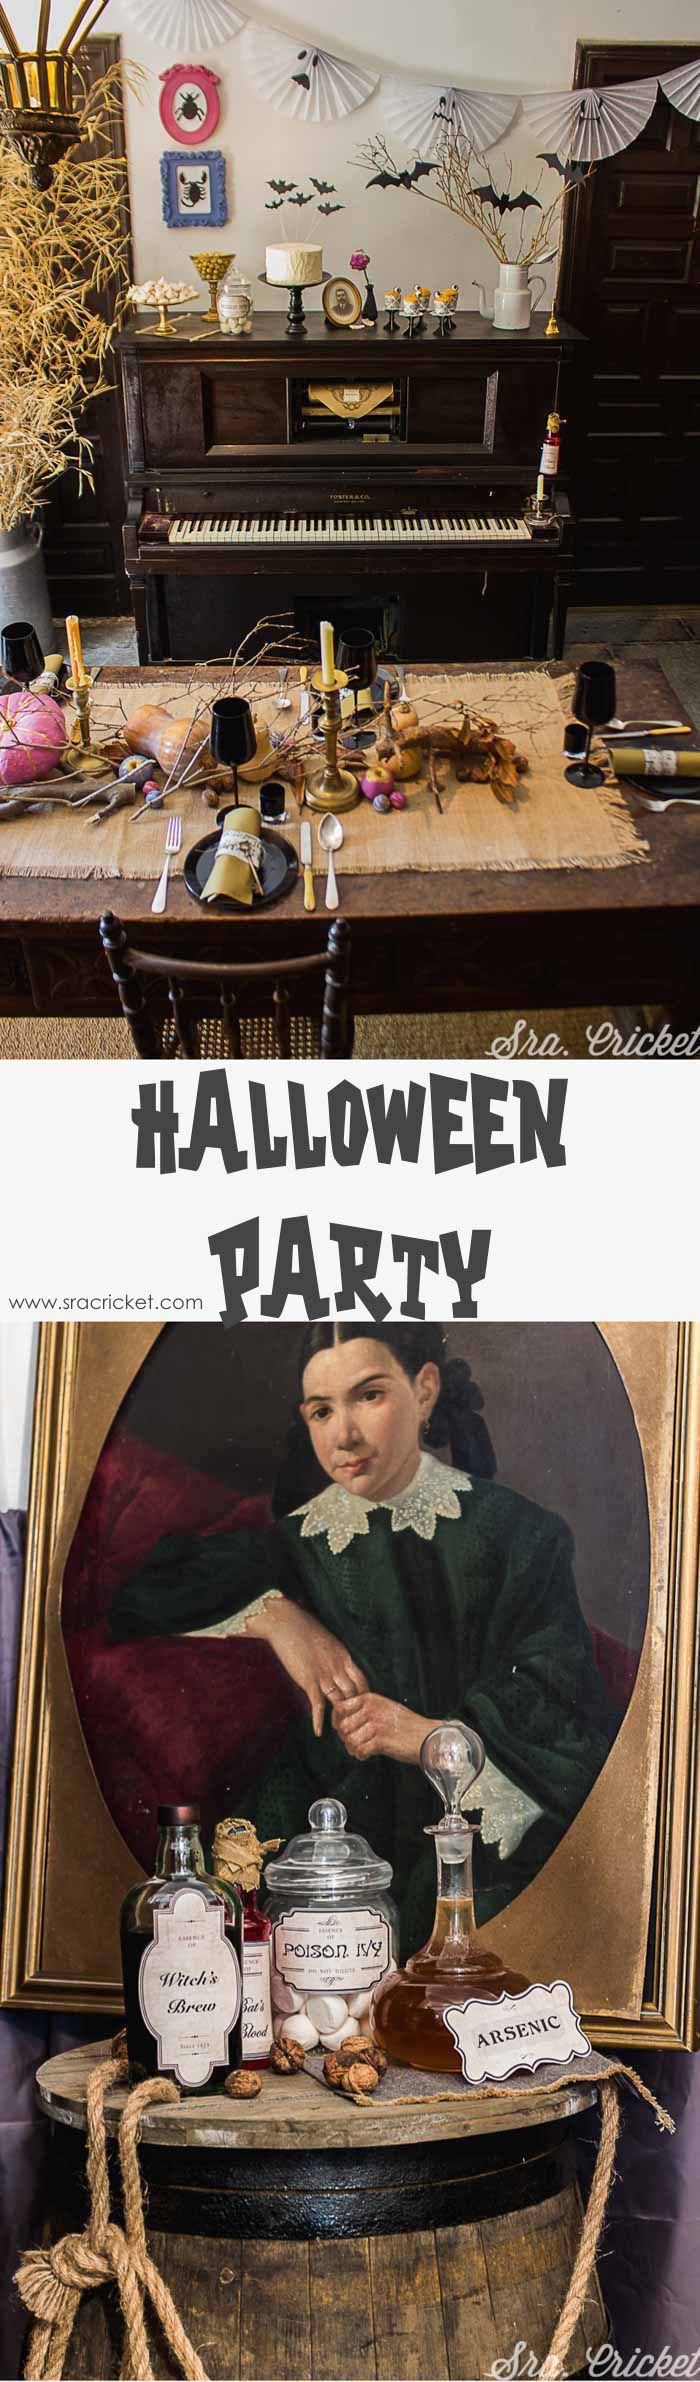 Fiesta de halloween infantil; cena de halloween para niños;  Decoración de halloween para cena #halloweeen #party #manualidades #decoration #crafts #carteles #kids #infantil